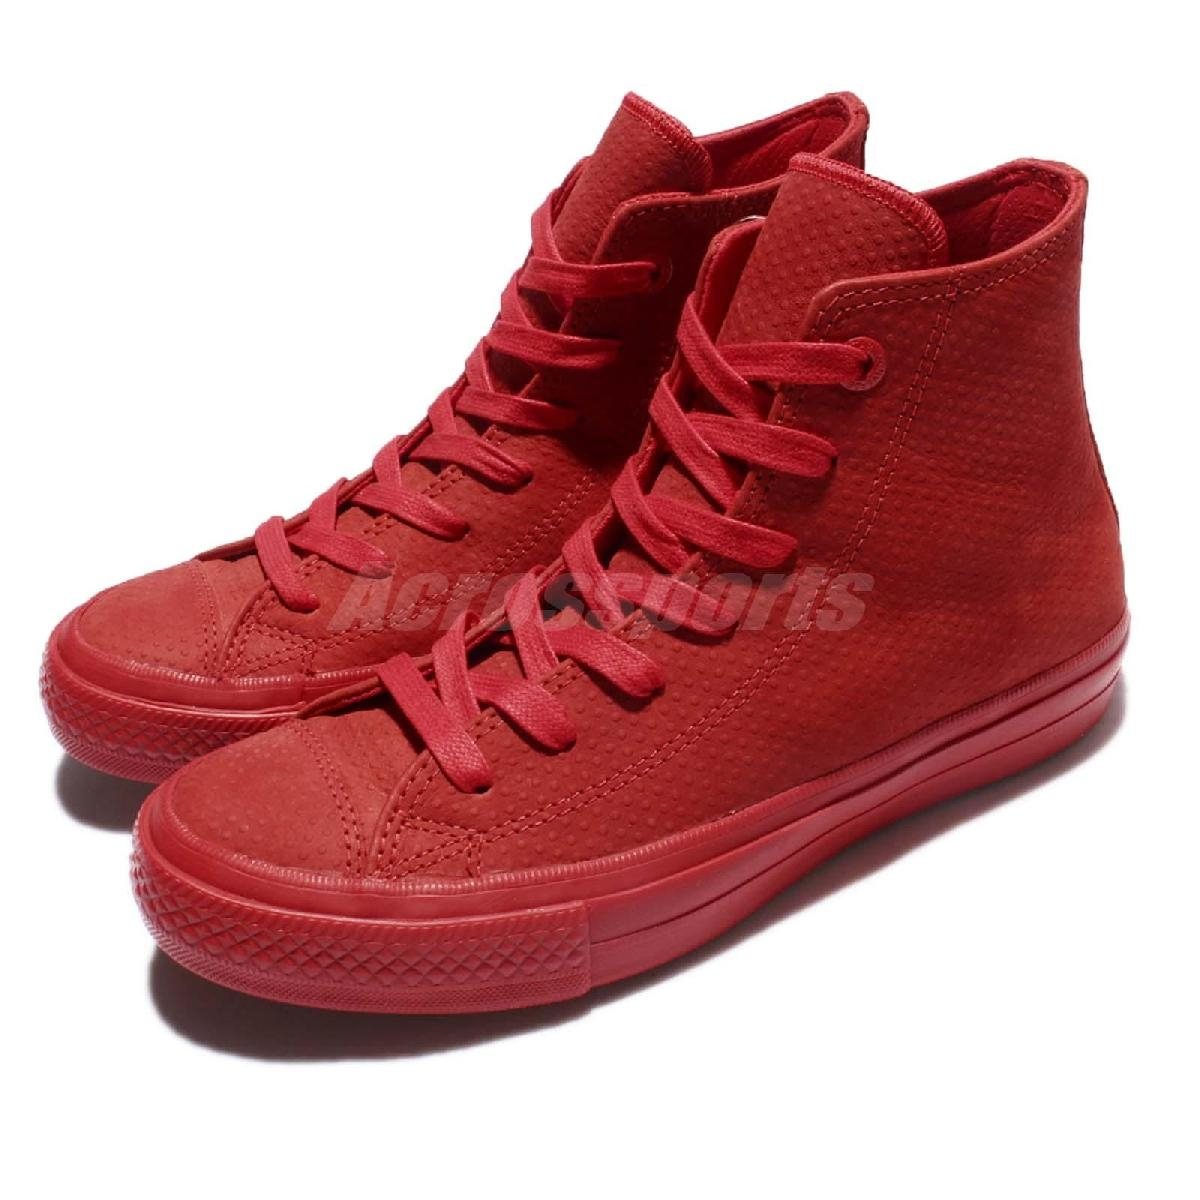 Converse休閒鞋Chuck Taylor All Star II紅全紅質感皮革帆布鞋男鞋女鞋PUMP306 155764C